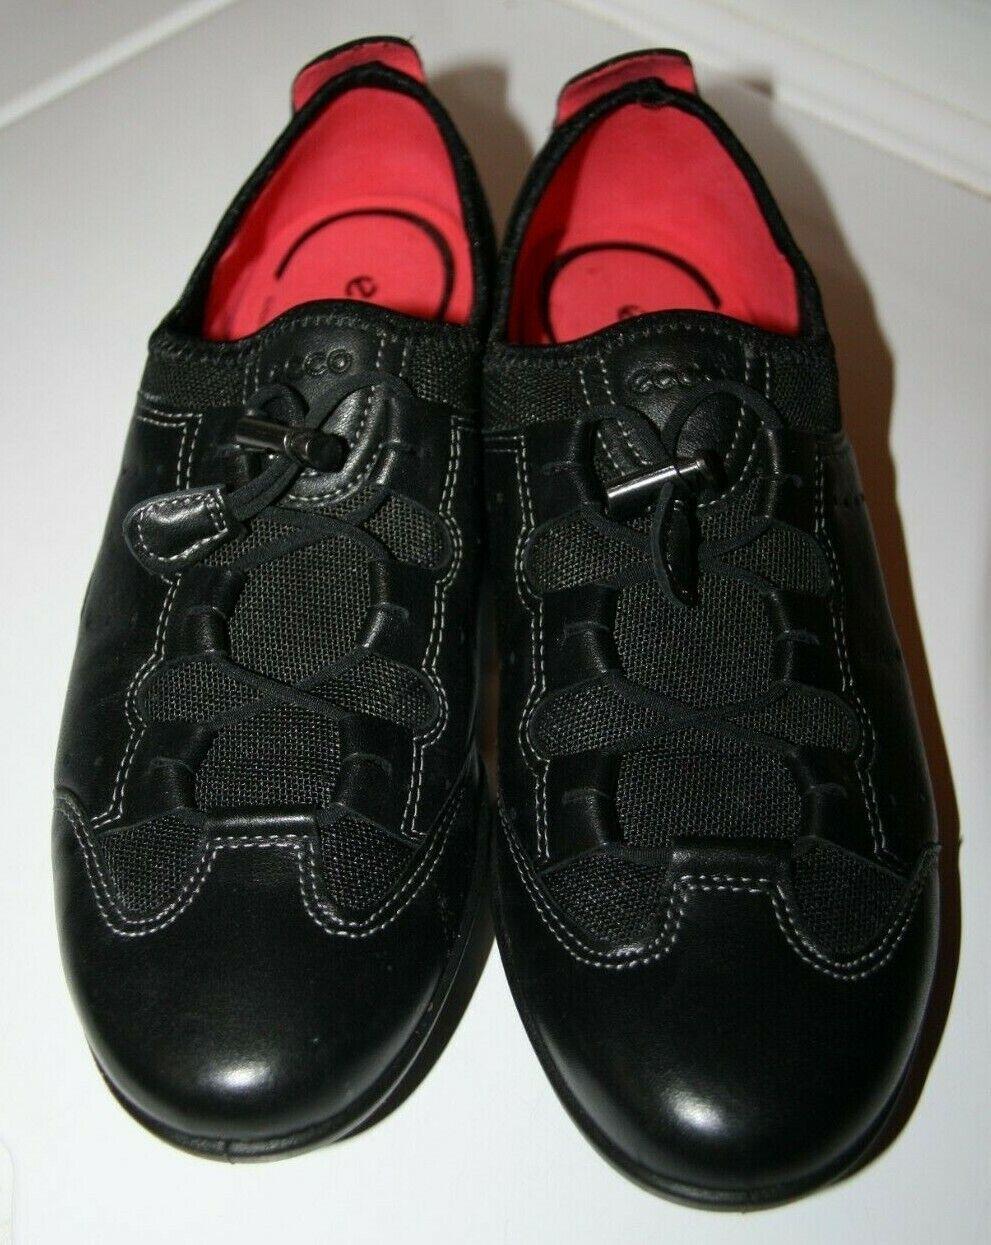 Ecco Women's 40 Black Lace Up Leather Shoes, Comfort Foam